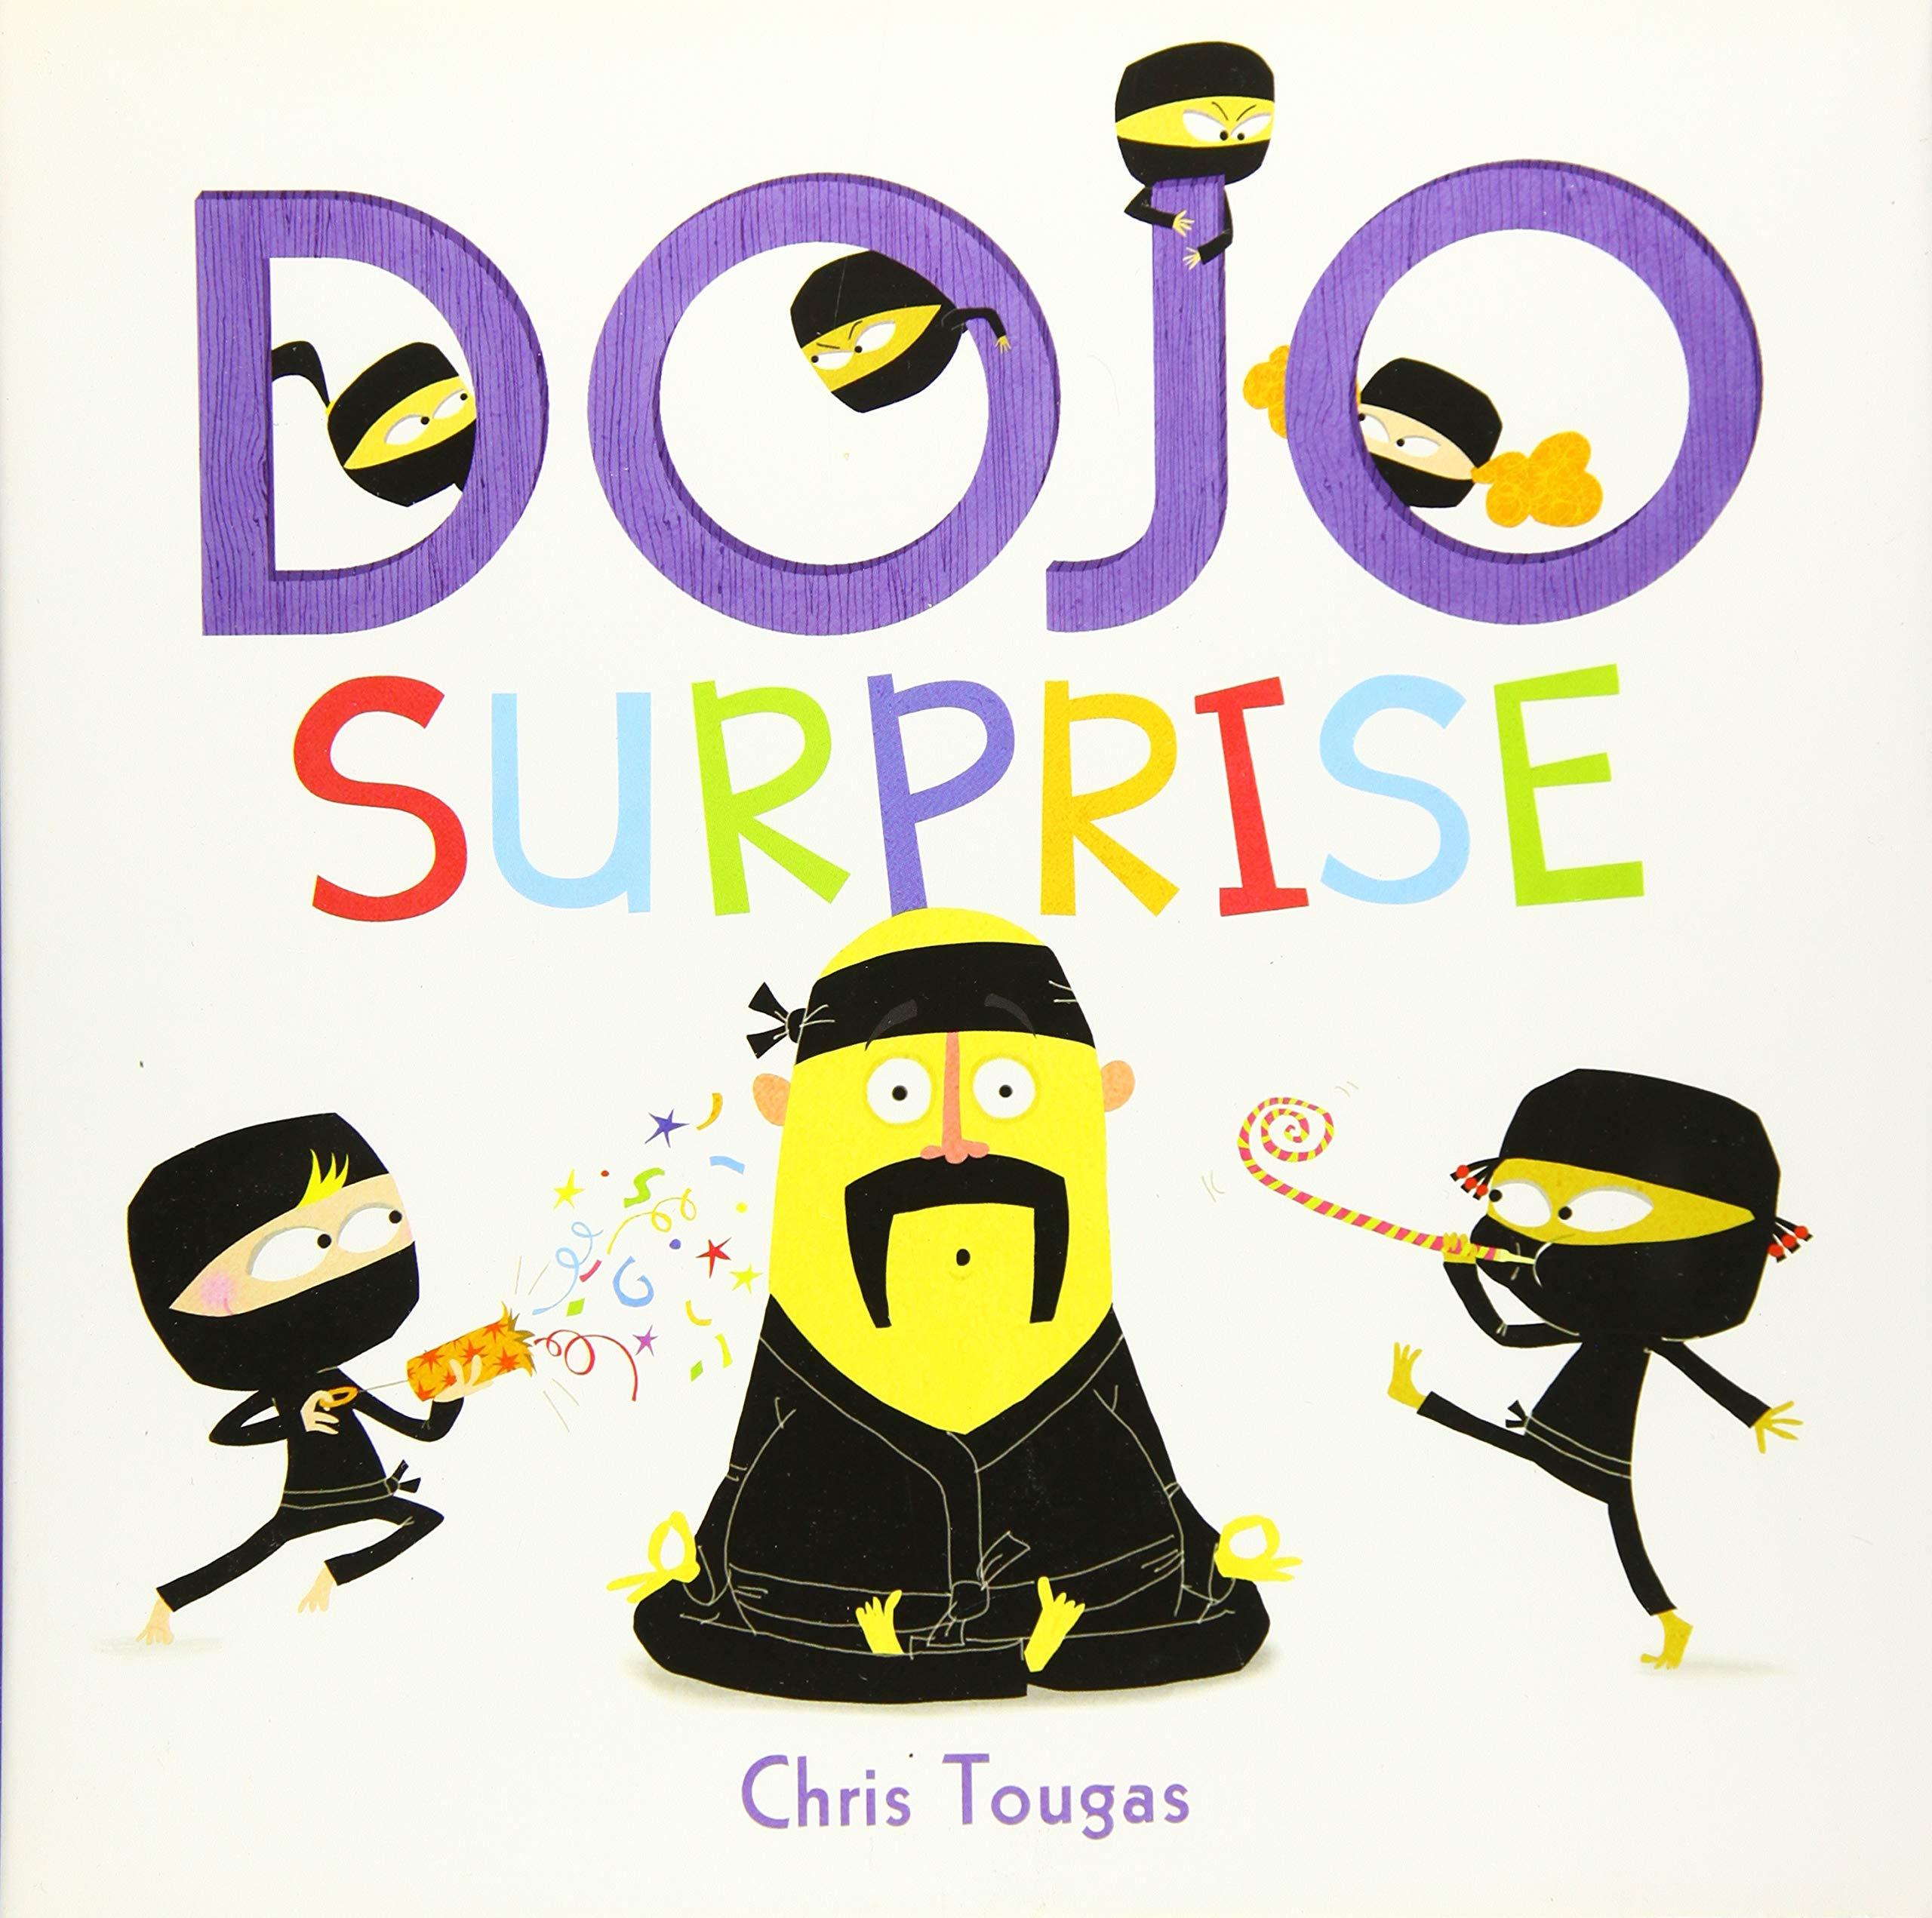 Dojo Surprise: Amazon.es: Chris Tougas: Libros en idiomas ...